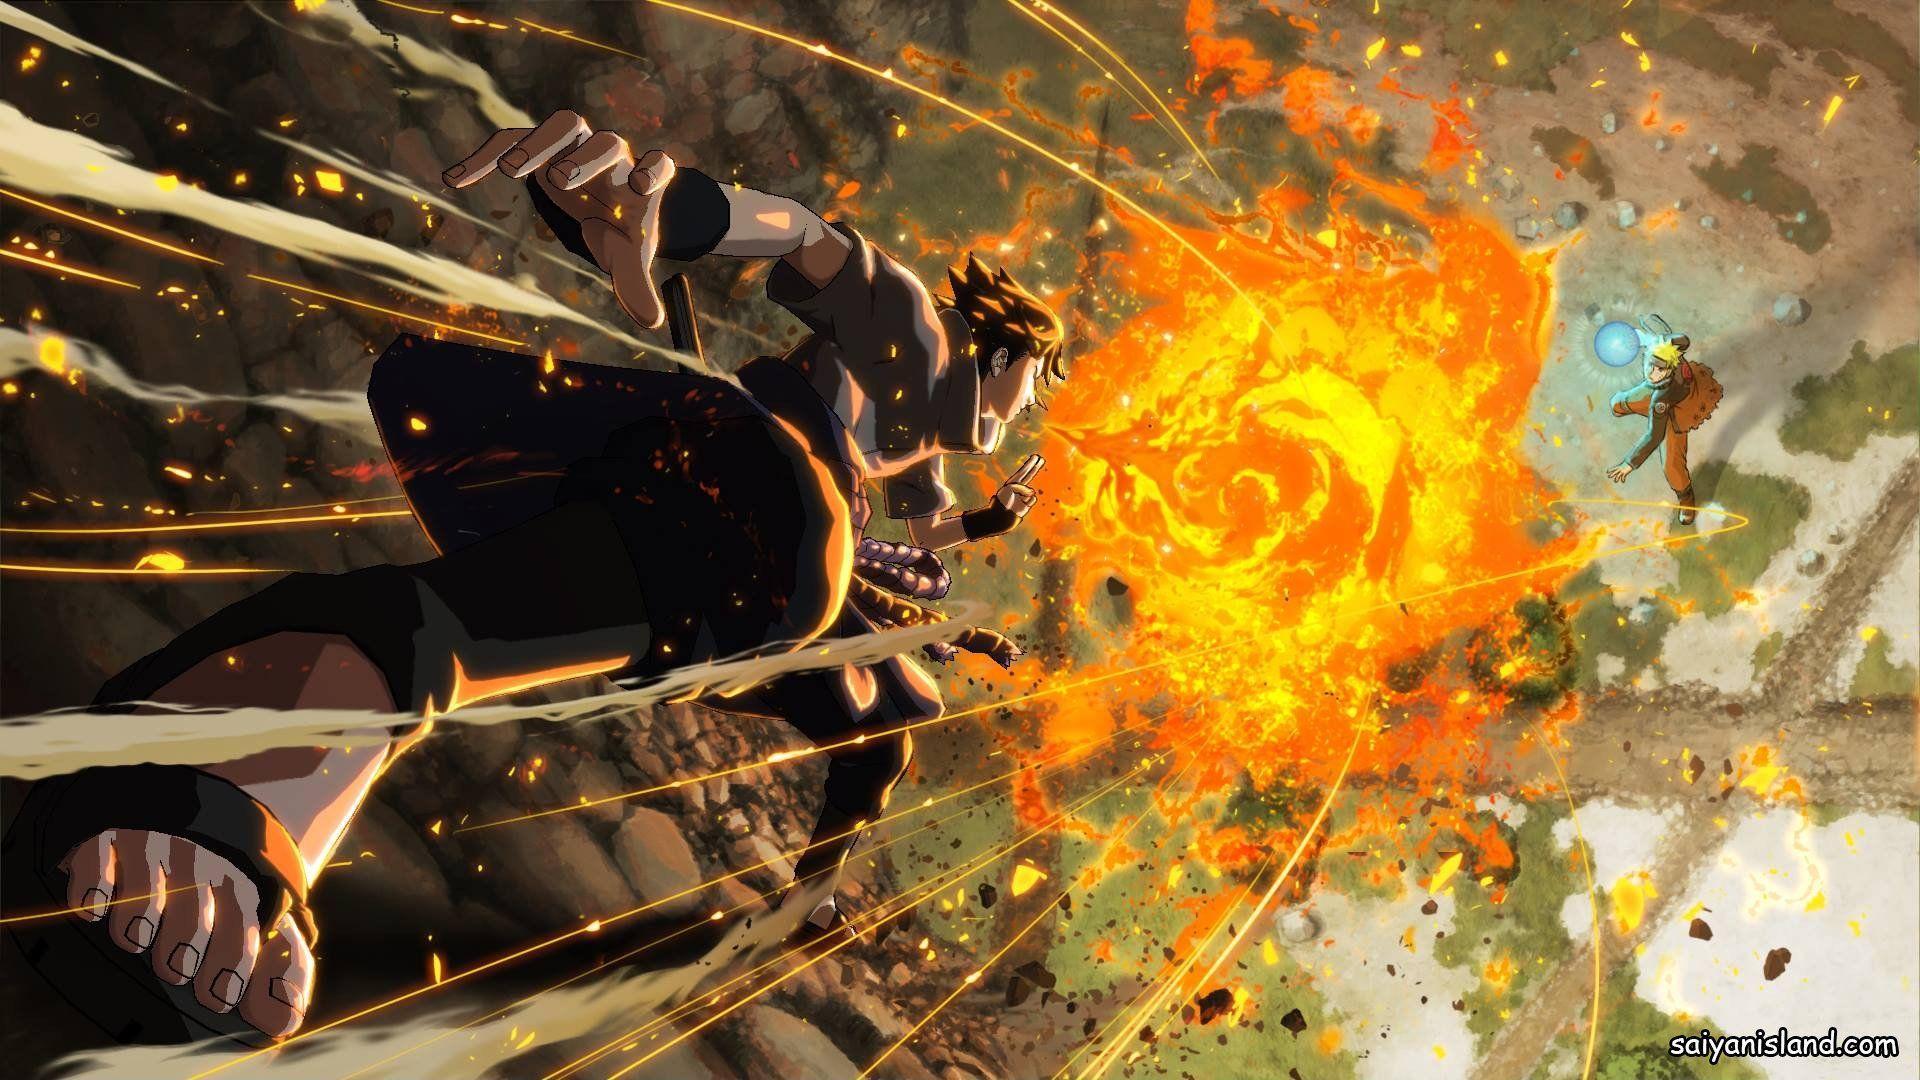 Naruto Shippuden: Ultimate Ninja Storm 4 Wallpapers - Wallpaper Cave